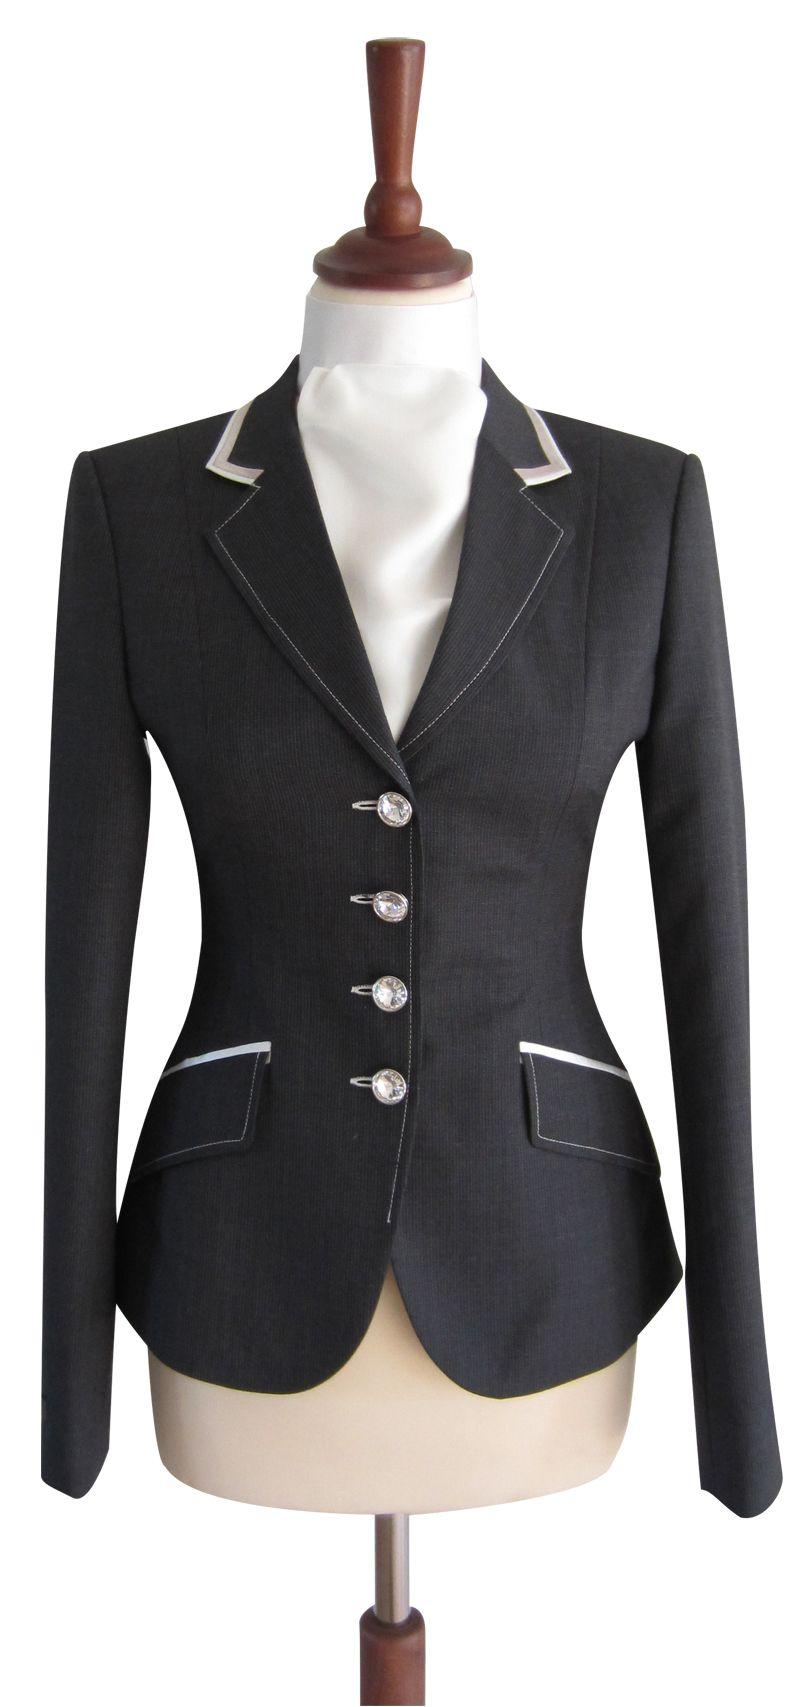 Juuls Jackets Show Jacket Riding Jacket For Women